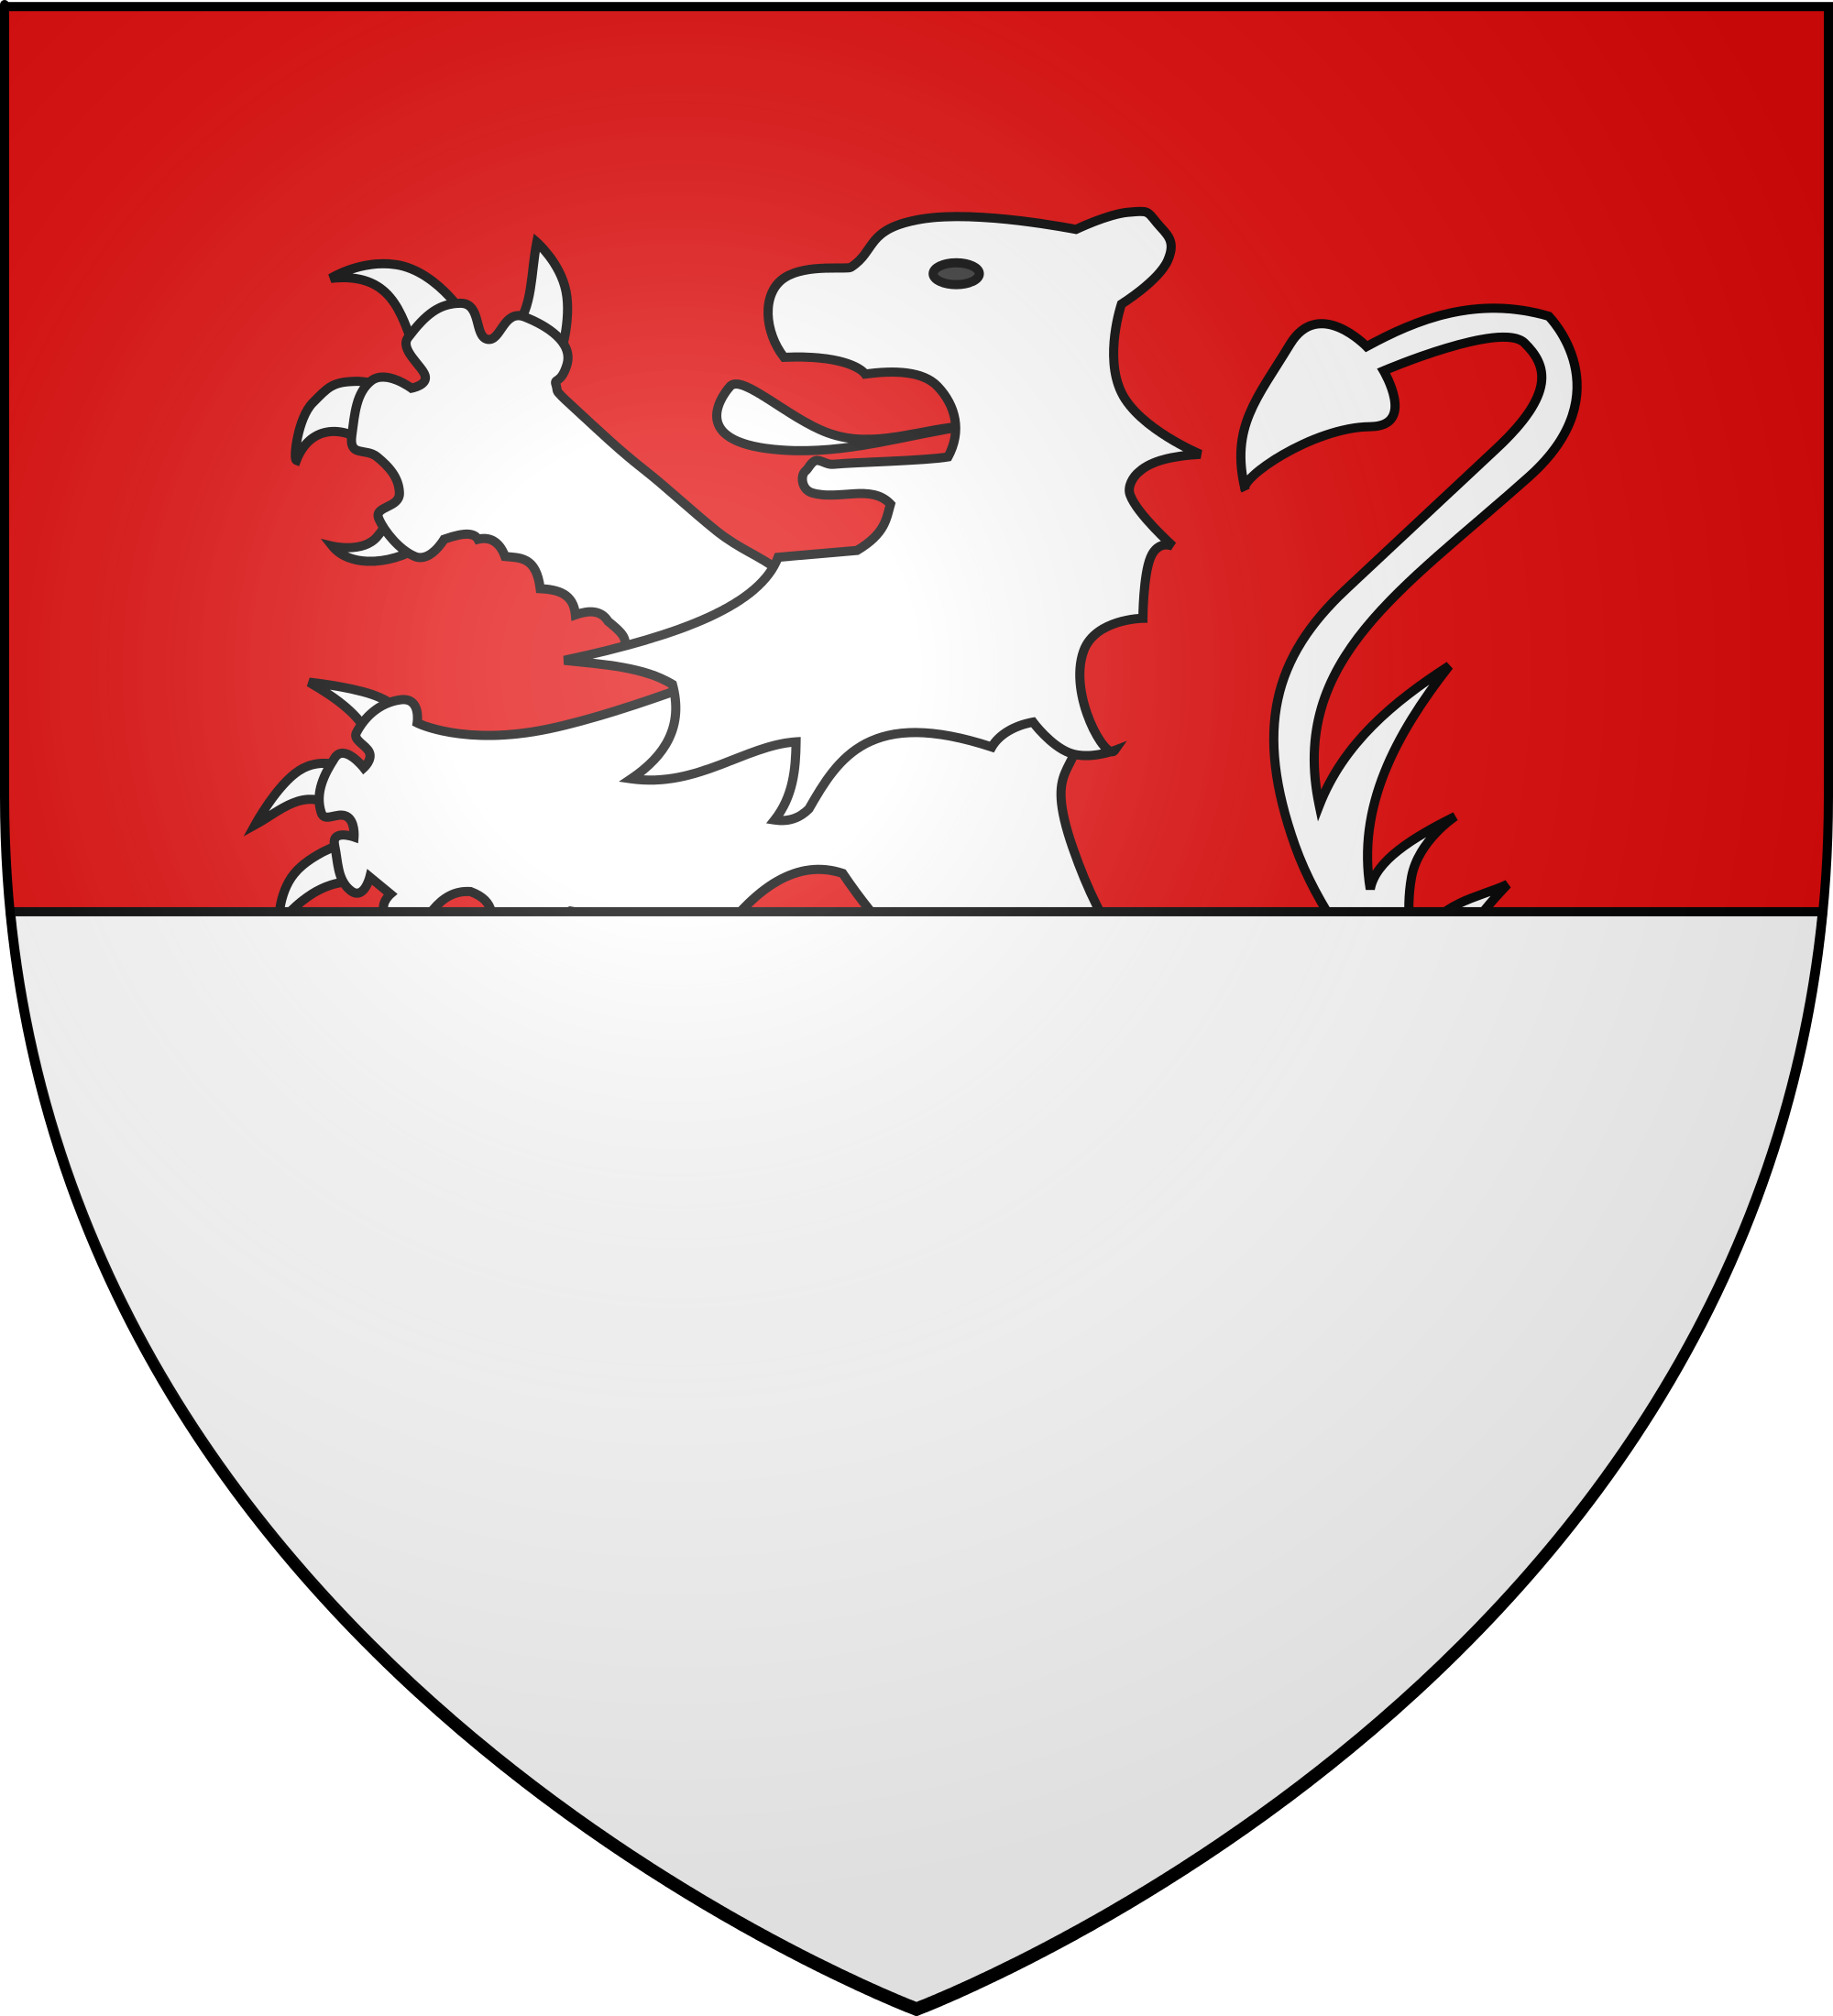 File:Armoiries d'Eltz de Rubenach.svg.